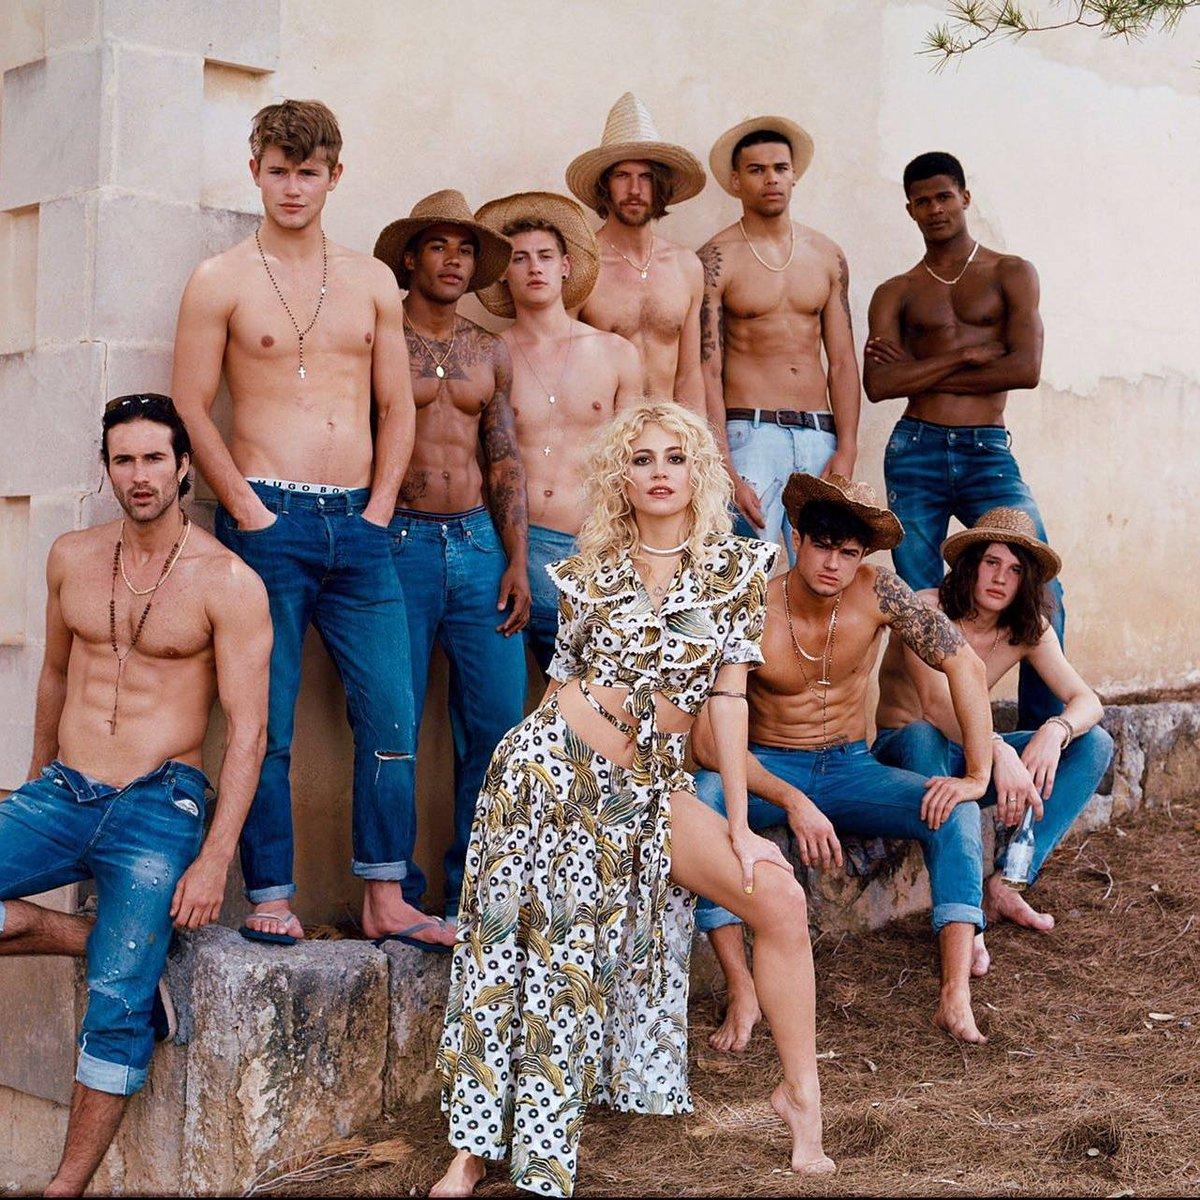 Cercada de modelos, Pixie Lott lança nova faixa. Veja o vídeo: https://t.co/UDbYLAPOyS https://t.co/kV4JDHUgJ0